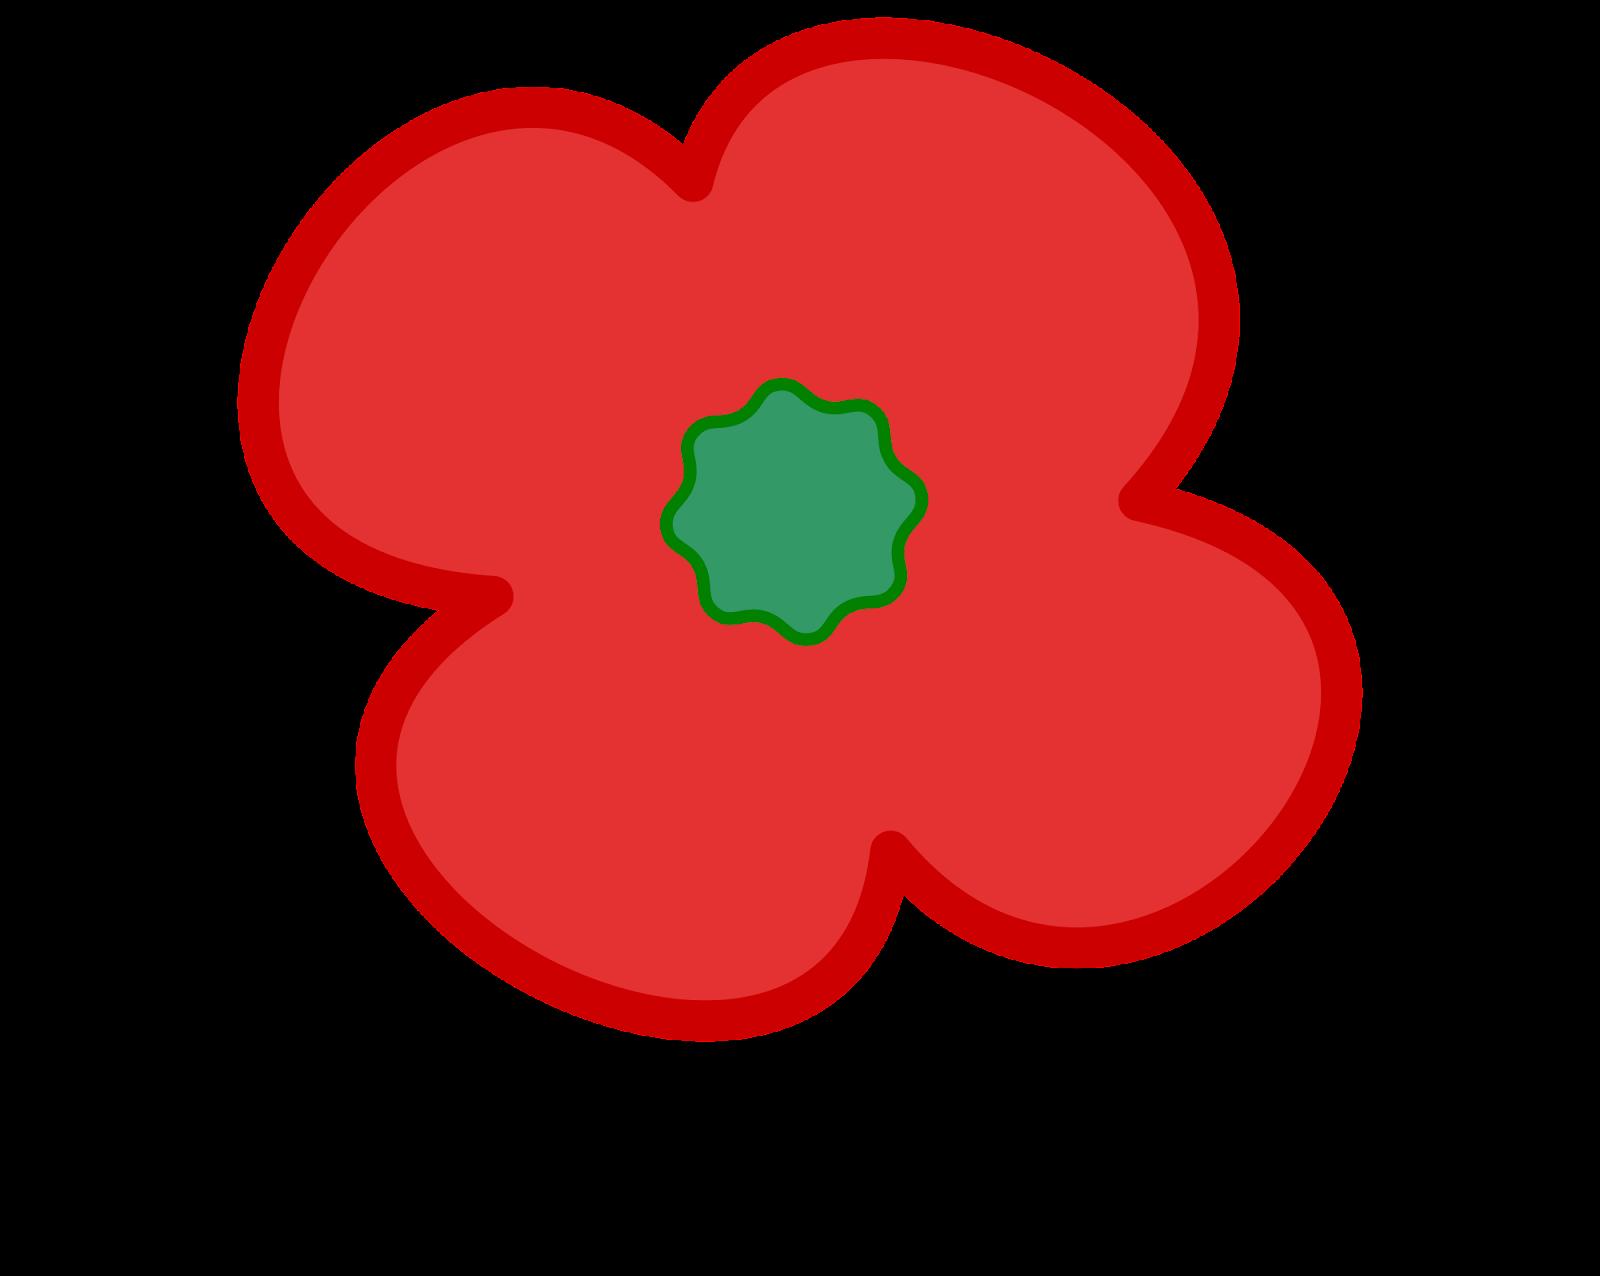 File:Poppy.svg - Wikimedia Commons